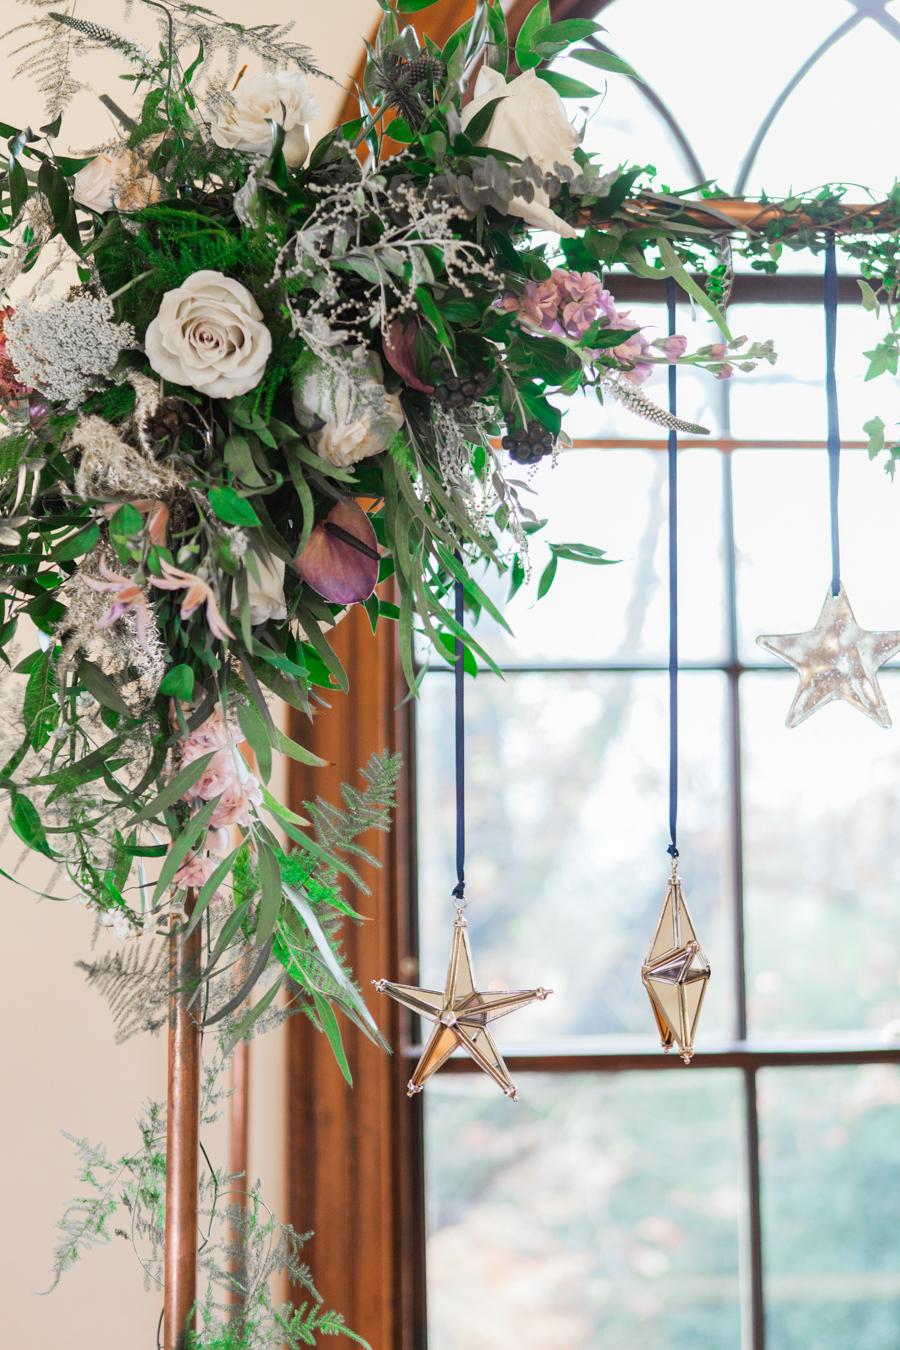 Starry celestial wedding inspiration (with a sprinkling of Disney magic) - Amanda Karen Photography (37)